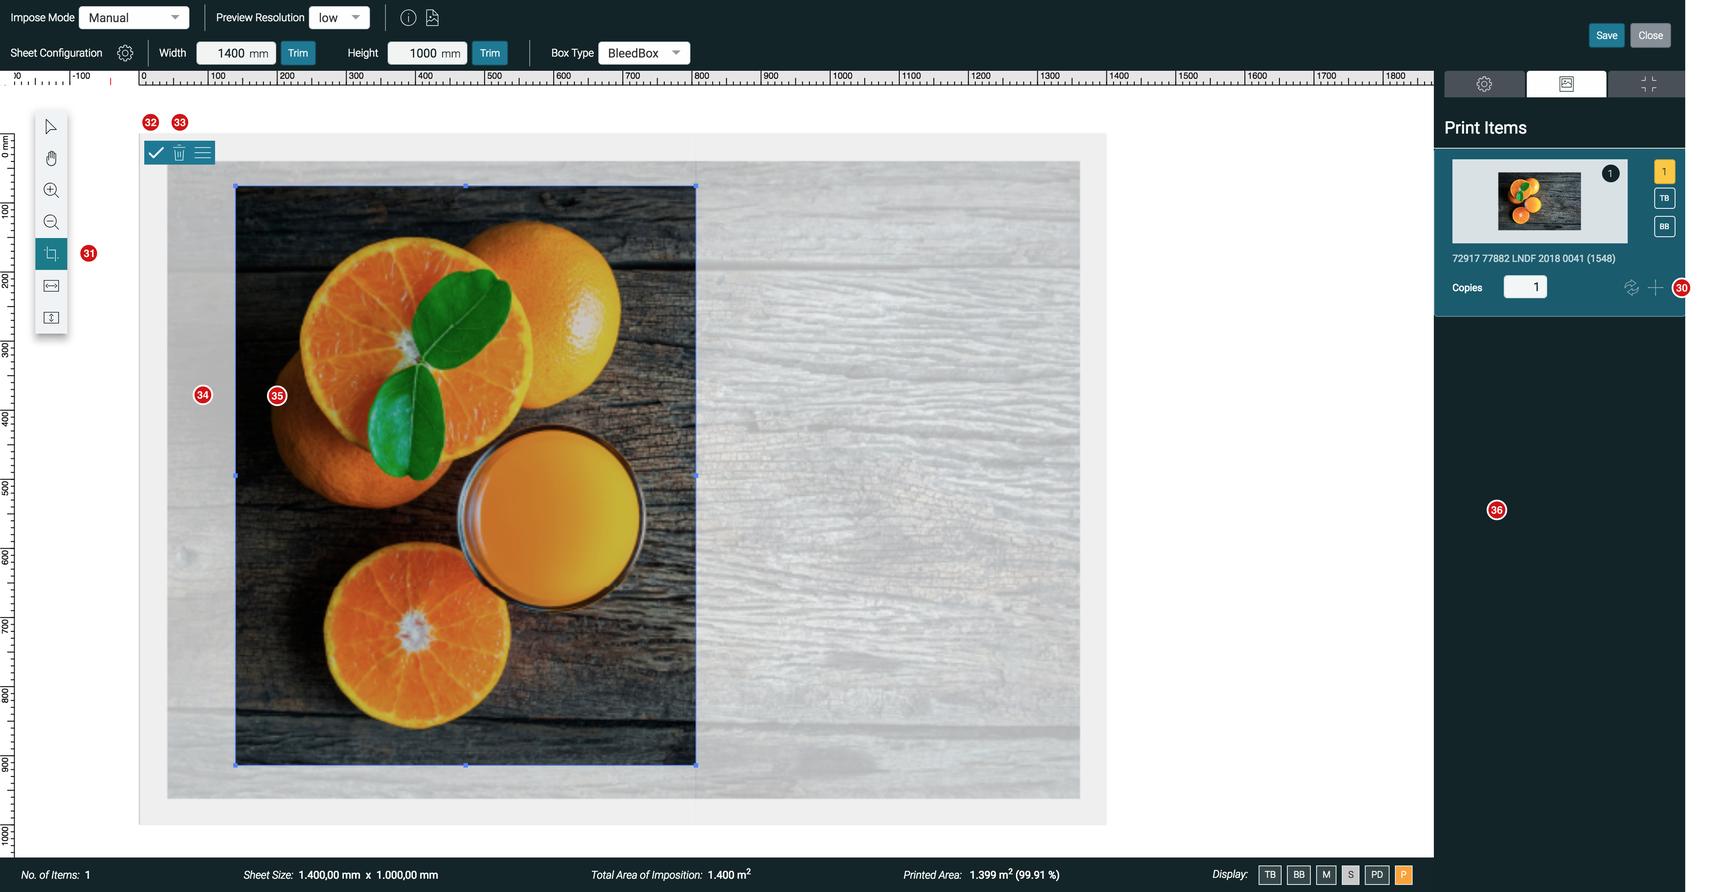 Impose Editor Crop Tool 1.7.2